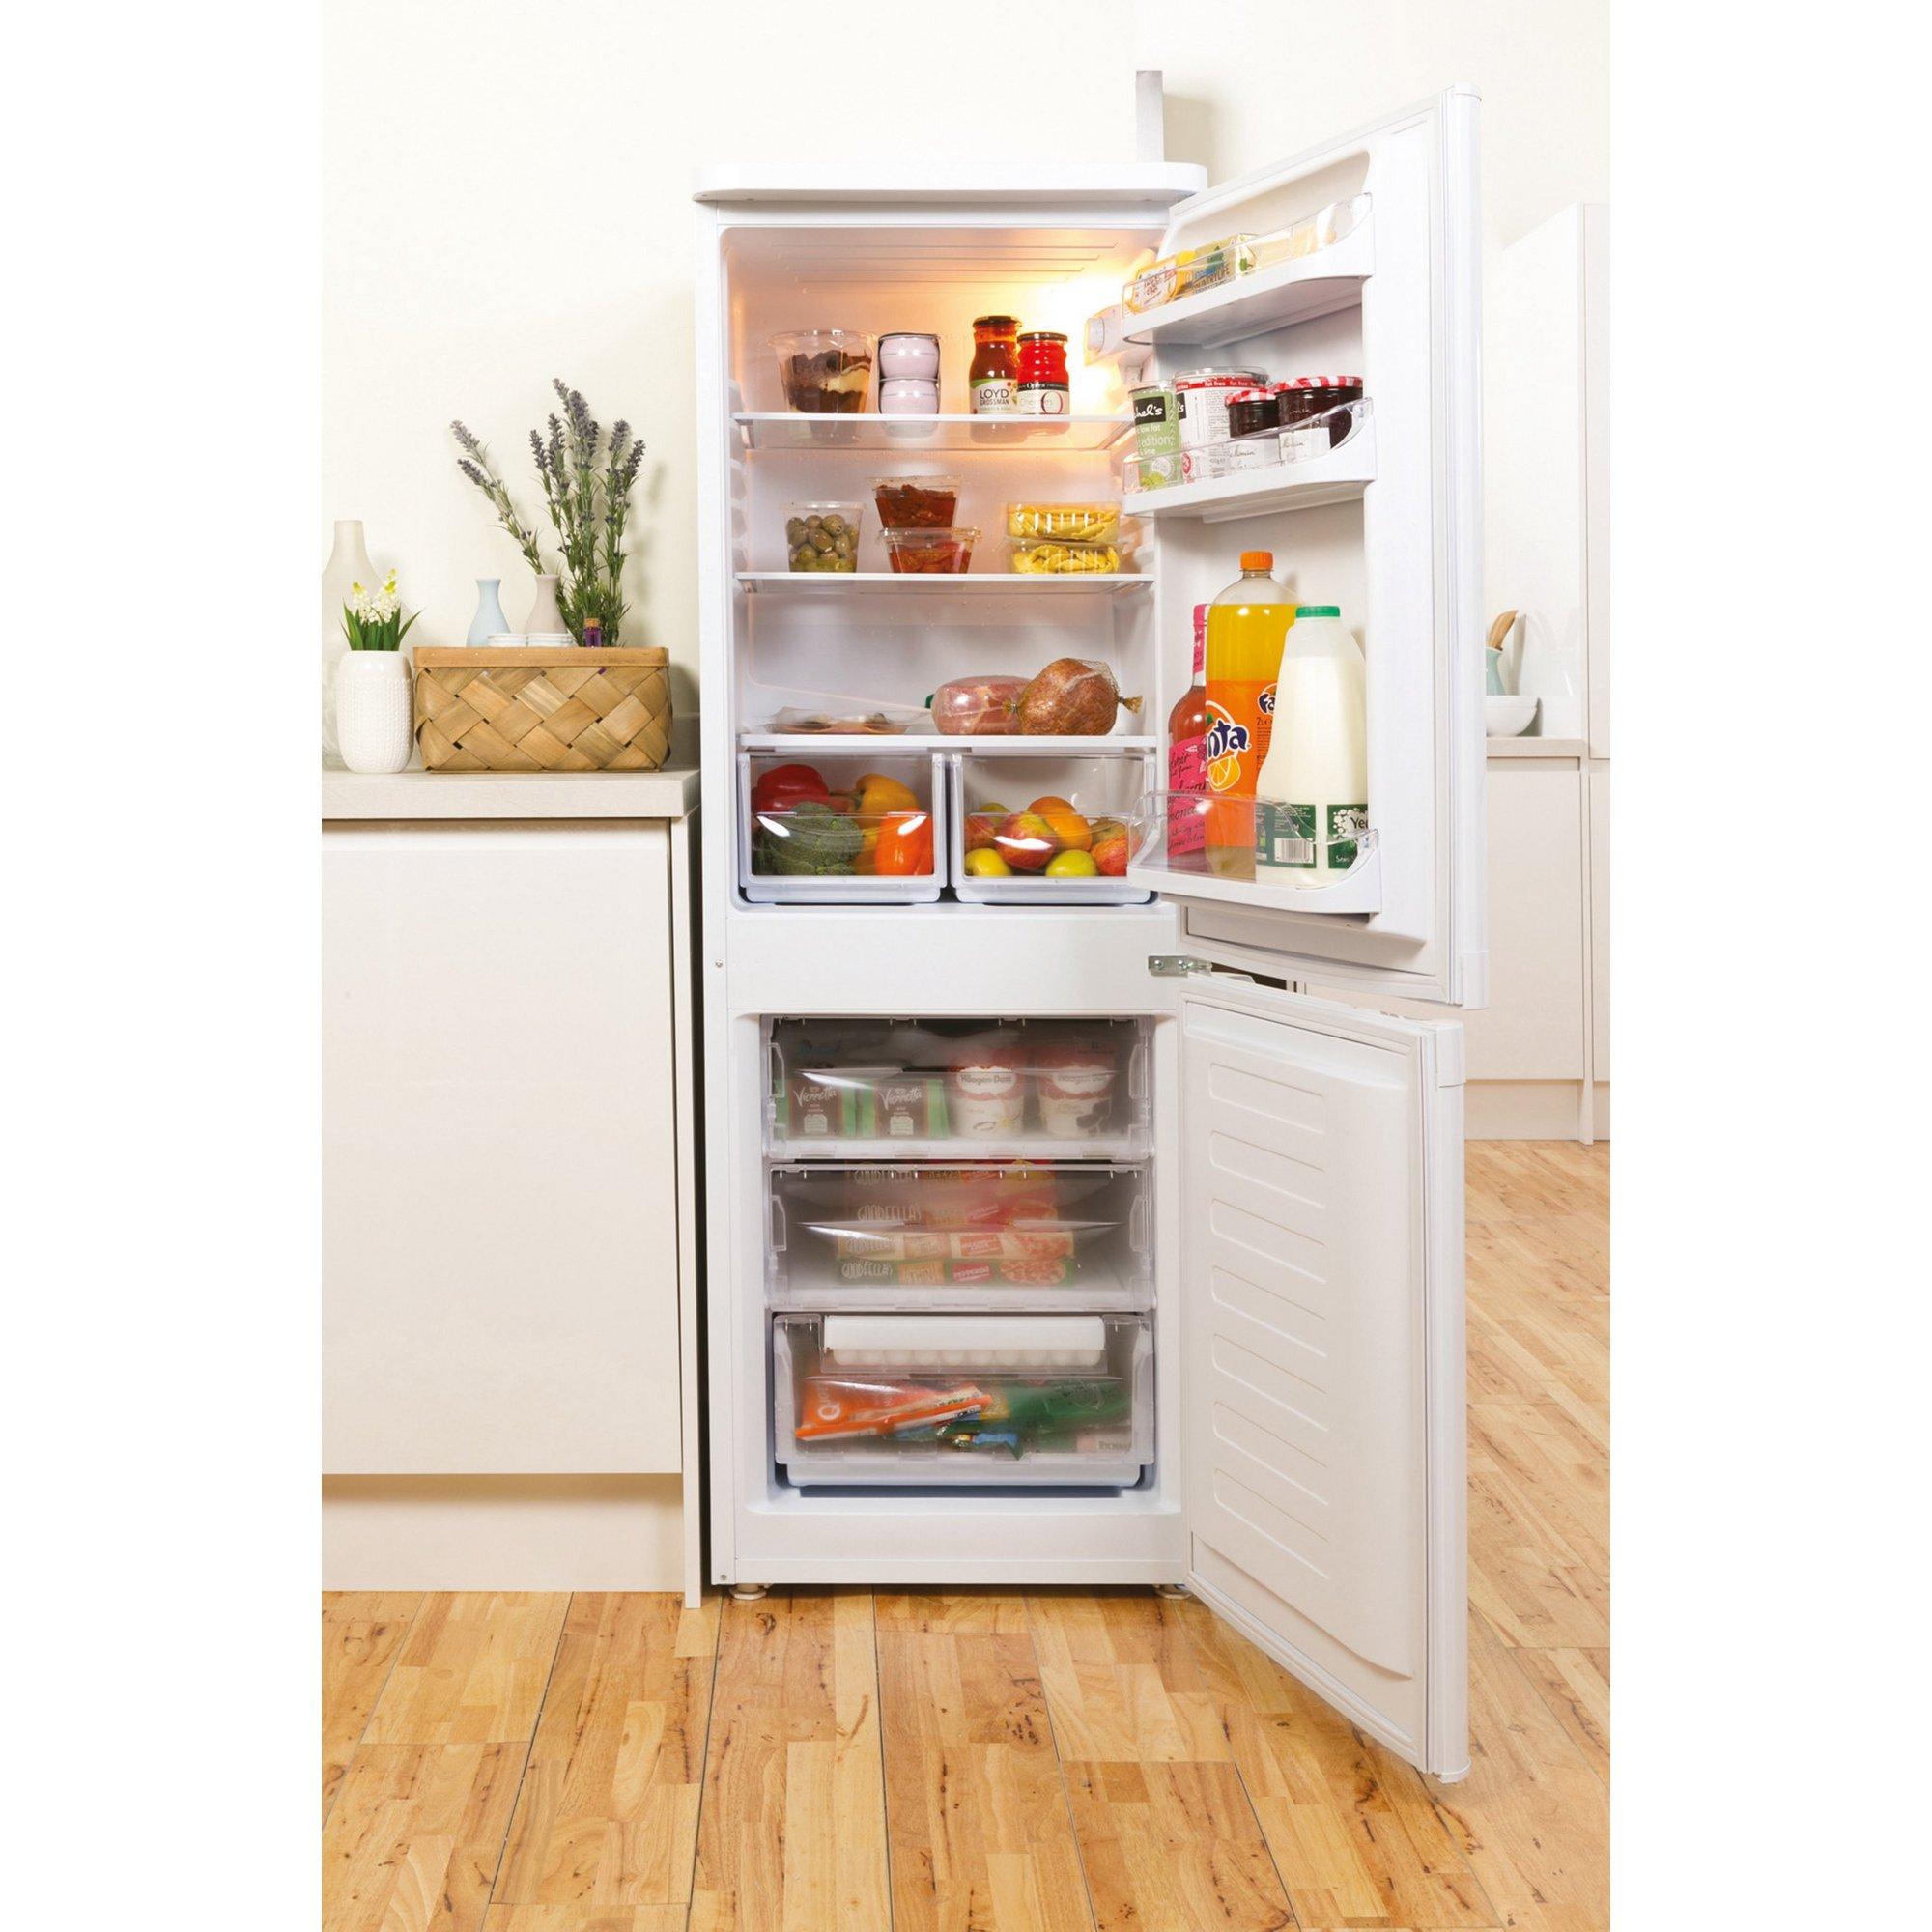 Image of Indesit 55cm 60/40 Fridge Freezer